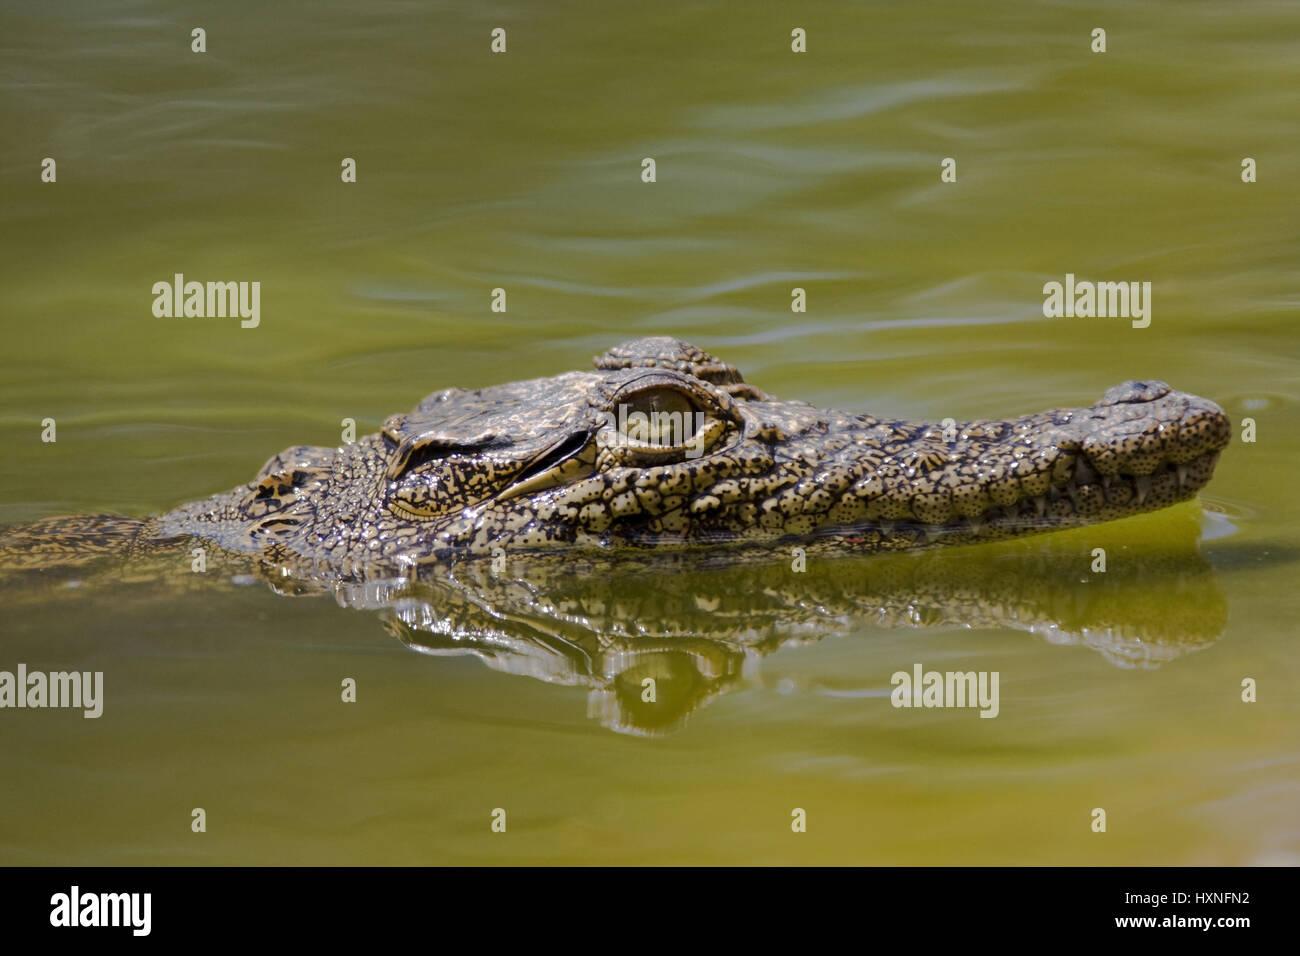 Nile crocodile, Crocodylus niloticus - Nile crocodile , Nilkrokodil | Crocodylus niloticus - Nile crocodile   mit - Stock Image